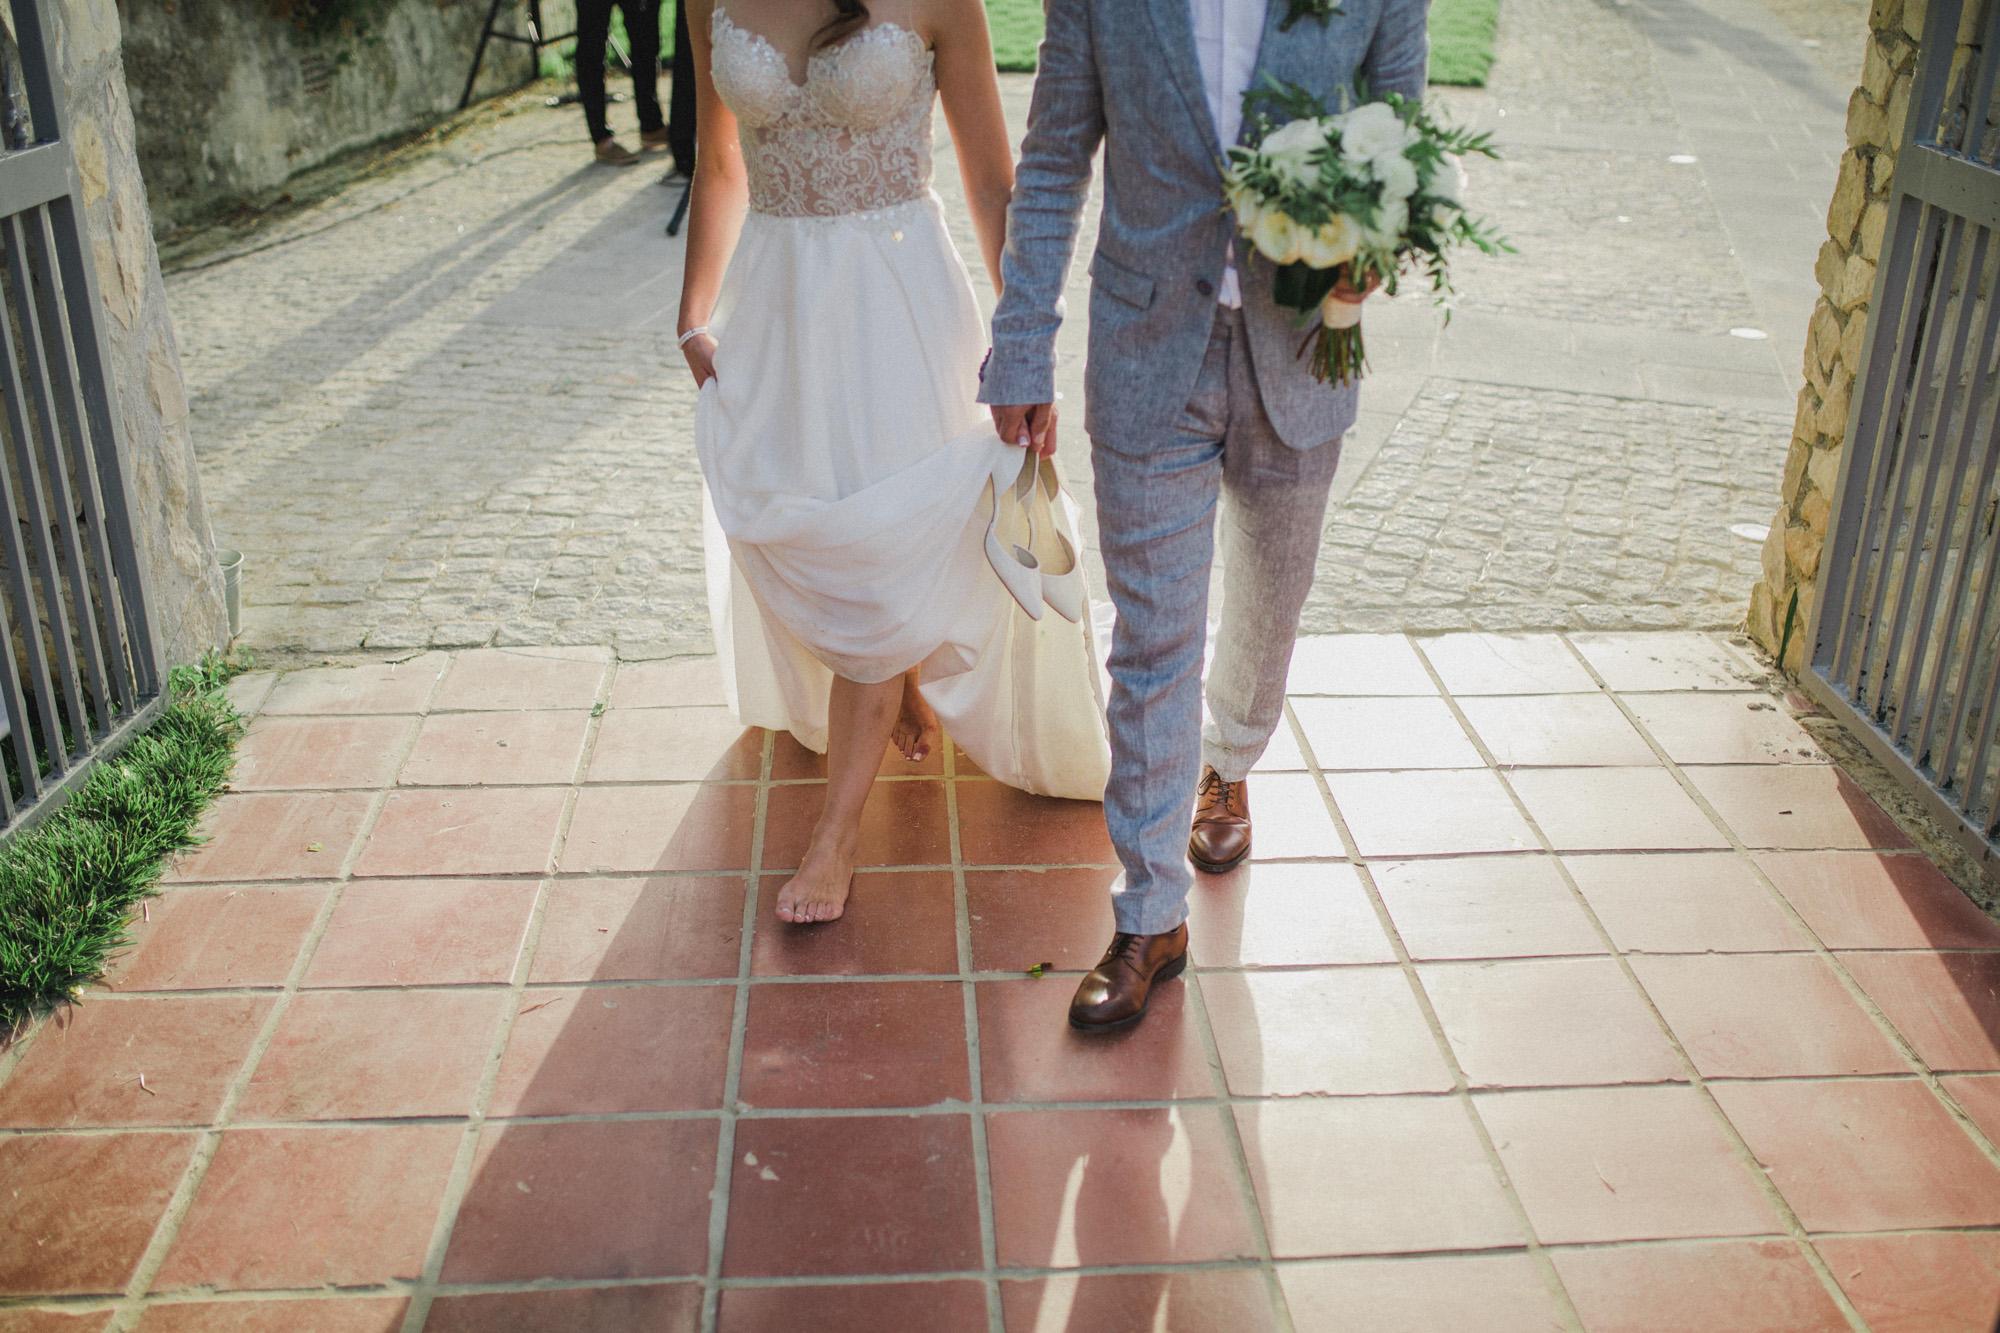 019-carina-e-samuel-wedding-casamento-quinta-dos-rouxinois-rustico-my-fancy-wedding-mafra-malveira-lisboa-sintra-cascais-filipe-santiago-fotografia-fotografo-lifestyle-destination-portugal